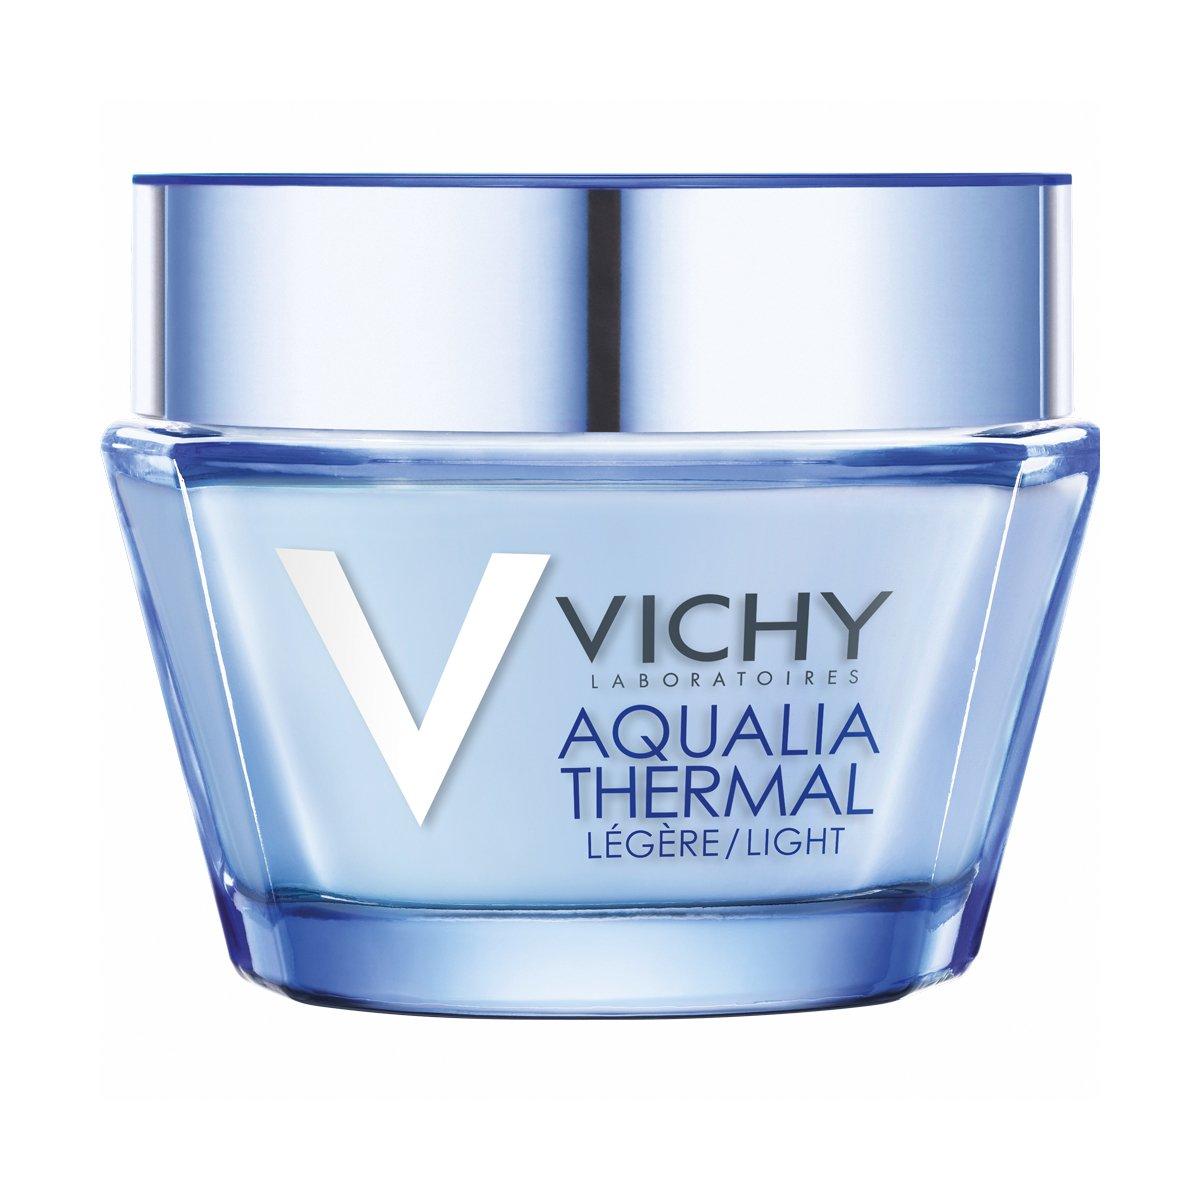 Vichy Aqualia Thermal Crema Viso Leggera